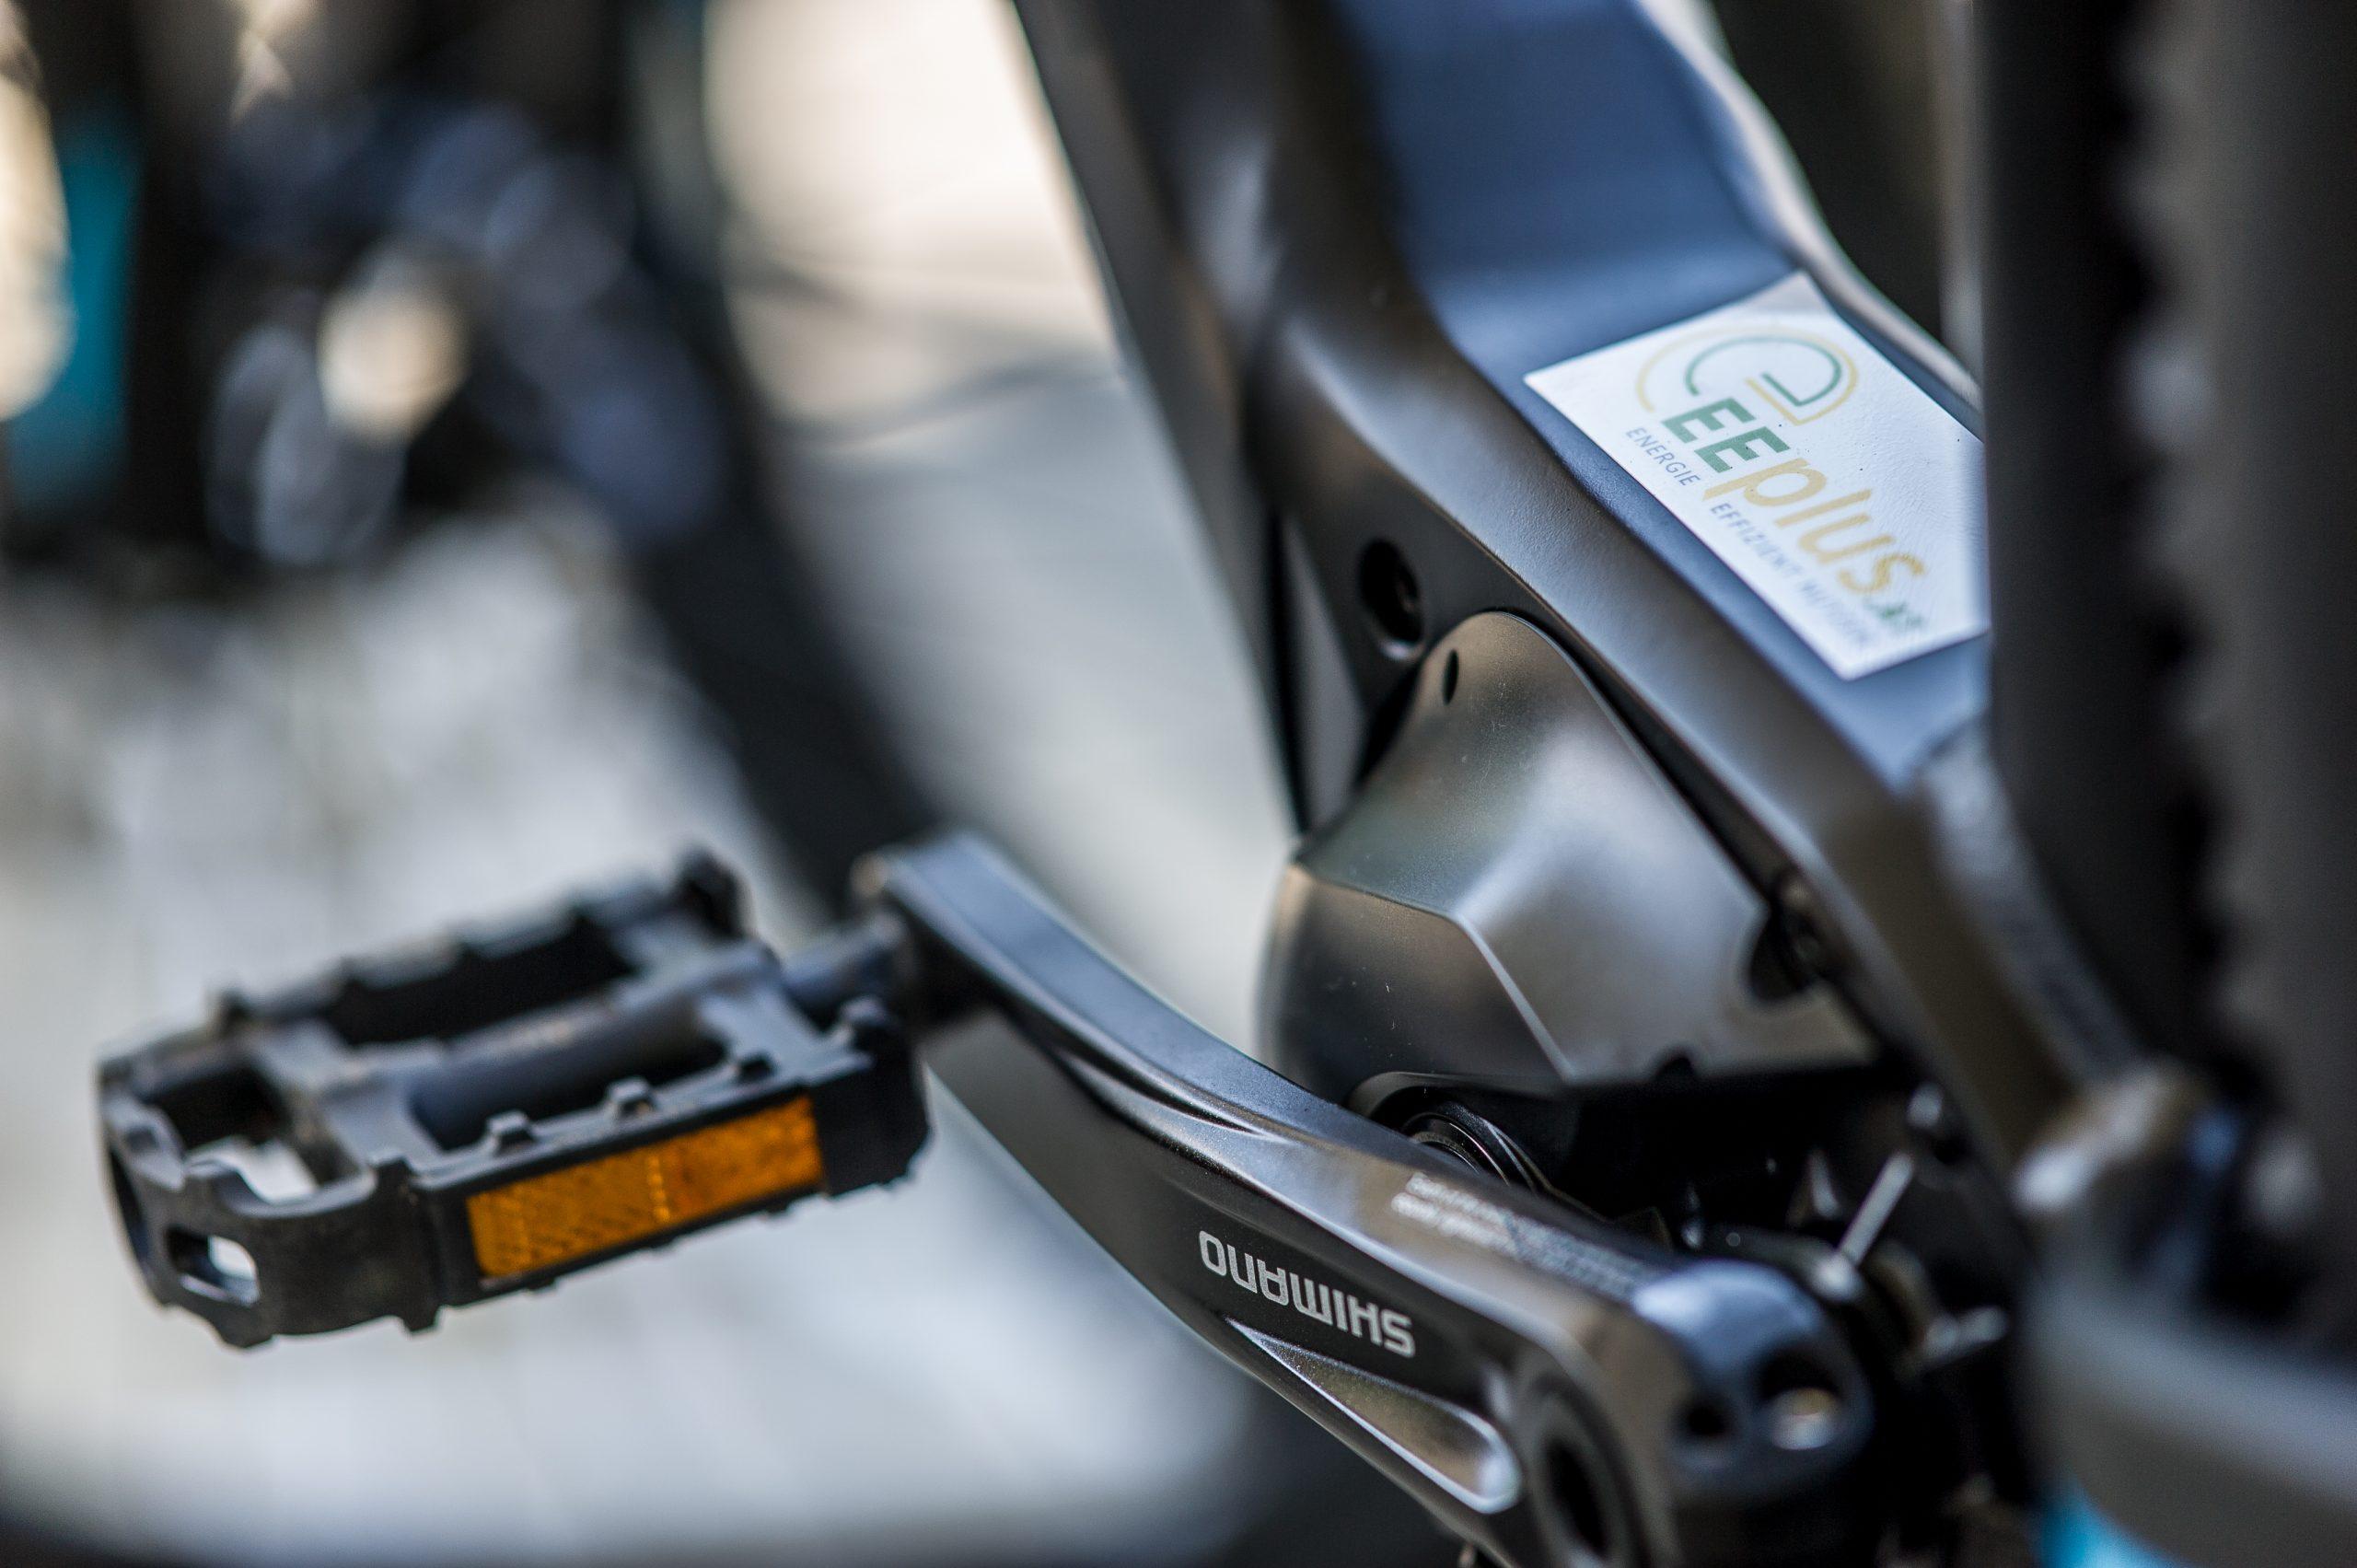 Uranbikeshop-E-Bikes-Verleih und Service - Akkuservice